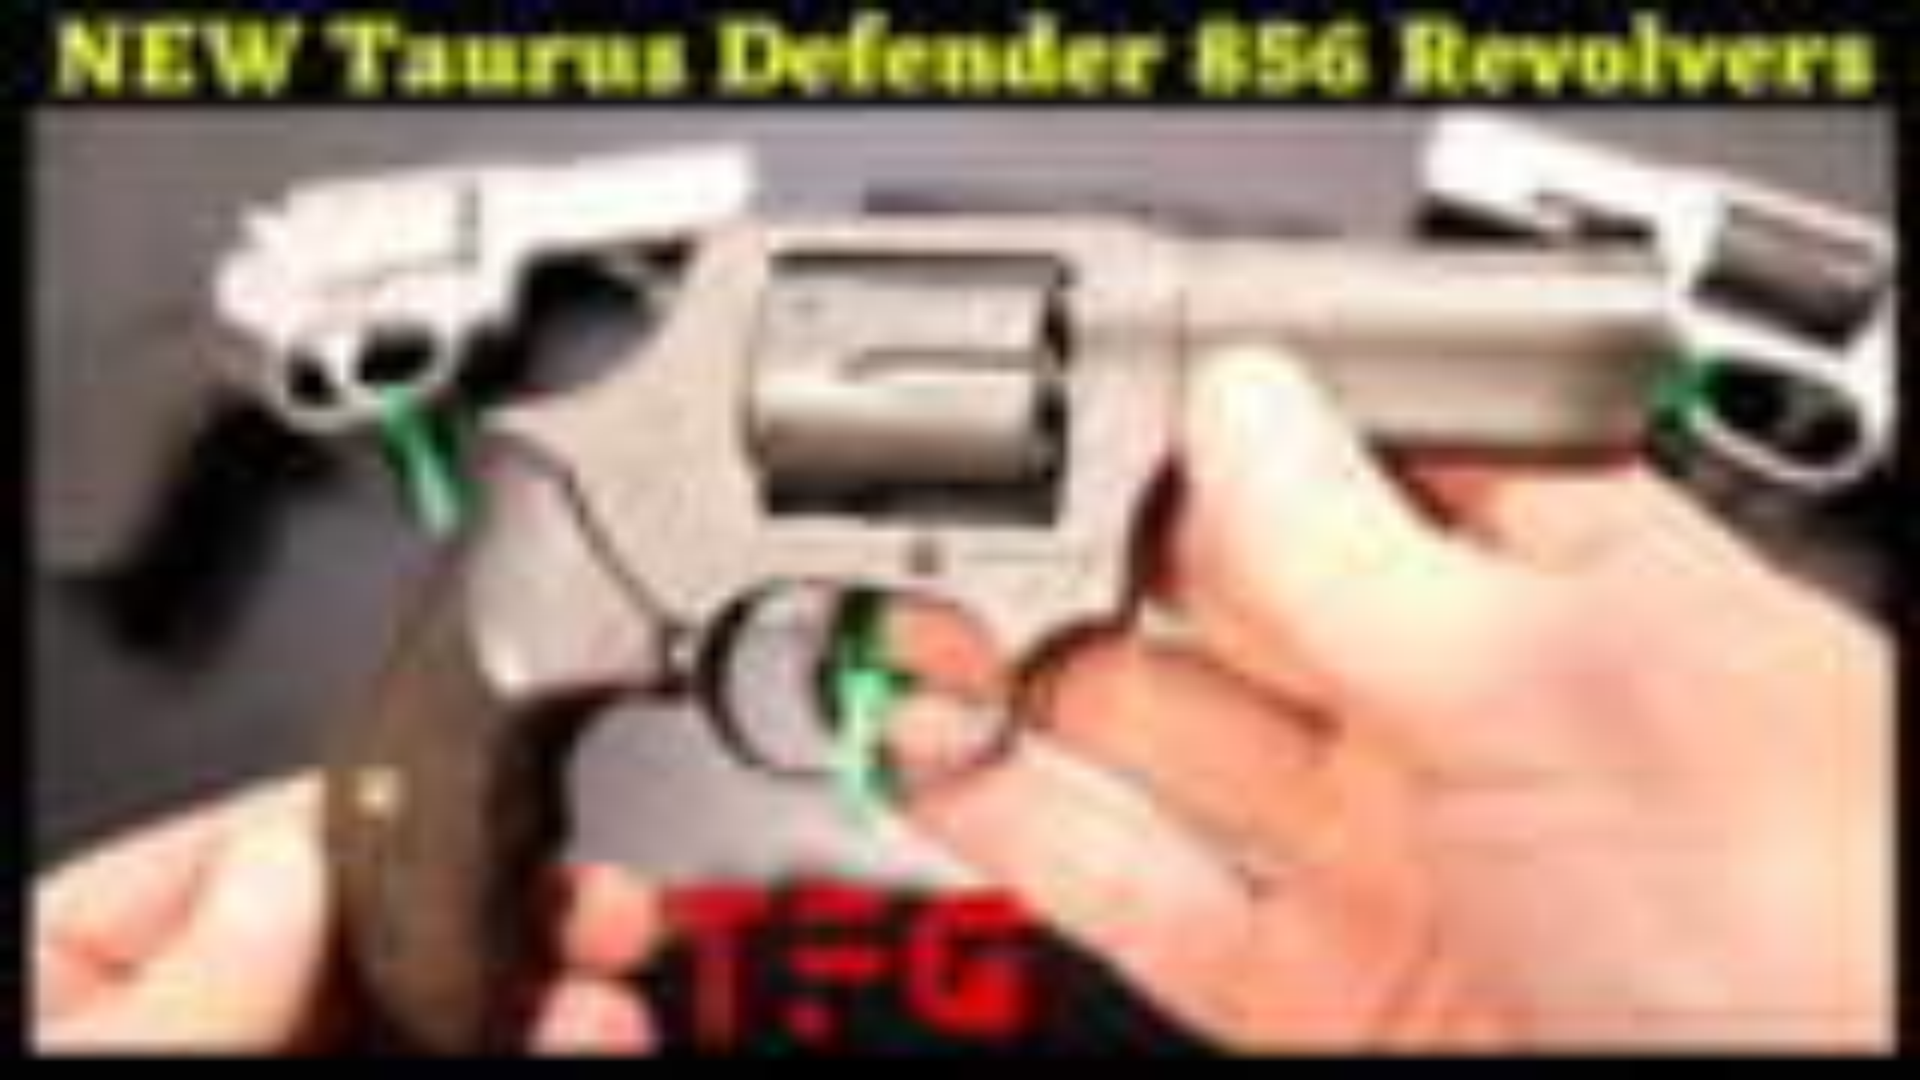 "[TheFirearmGuy]陶努斯新""辩护人""856左轮手枪"